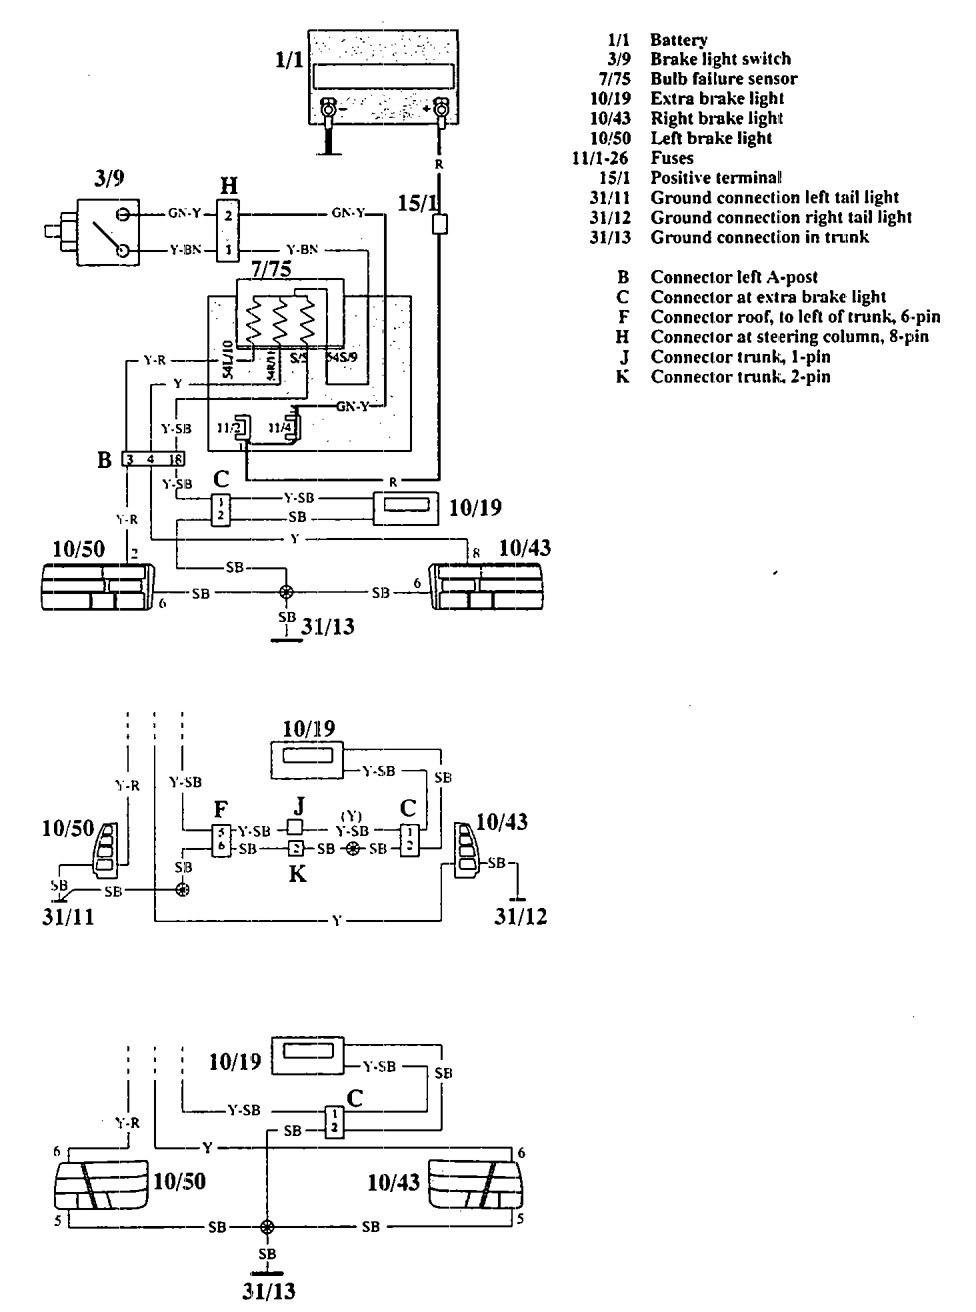 Volvo 940 Wiring Diagram Radio - Wiring Diagram Replace silk-archive -  silk-archive.miramontiseo.it | Volvo 940 Wiring Diagram Radio |  | silk-archive.miramontiseo.it